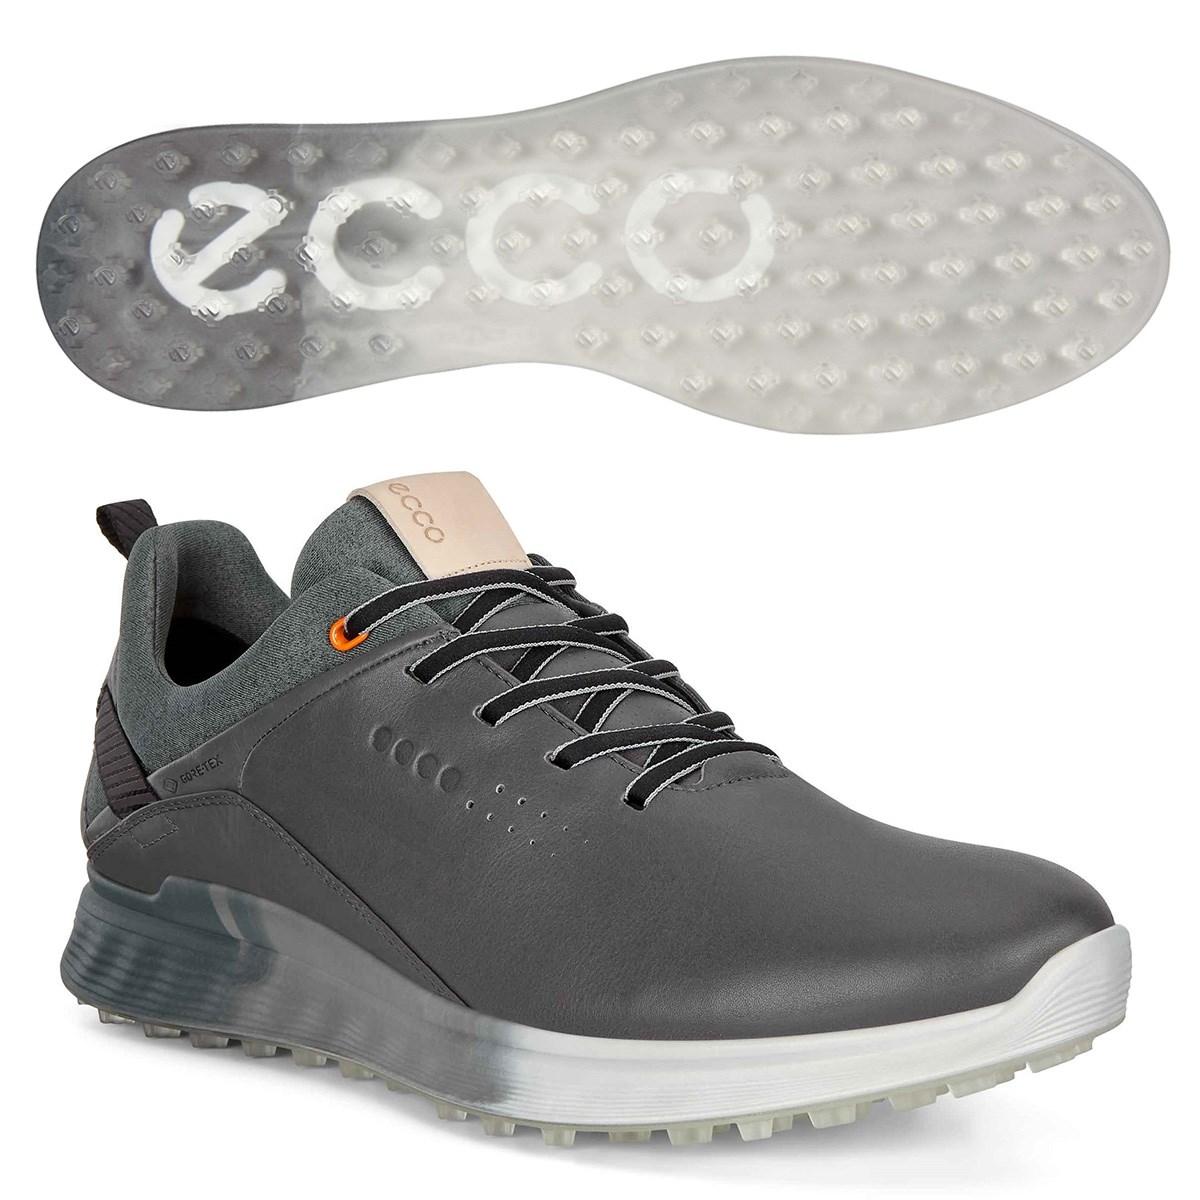 ecco エコー ゴルフ S-THREE GTX シューズ 24.5cm/EUサイズ39 グレー